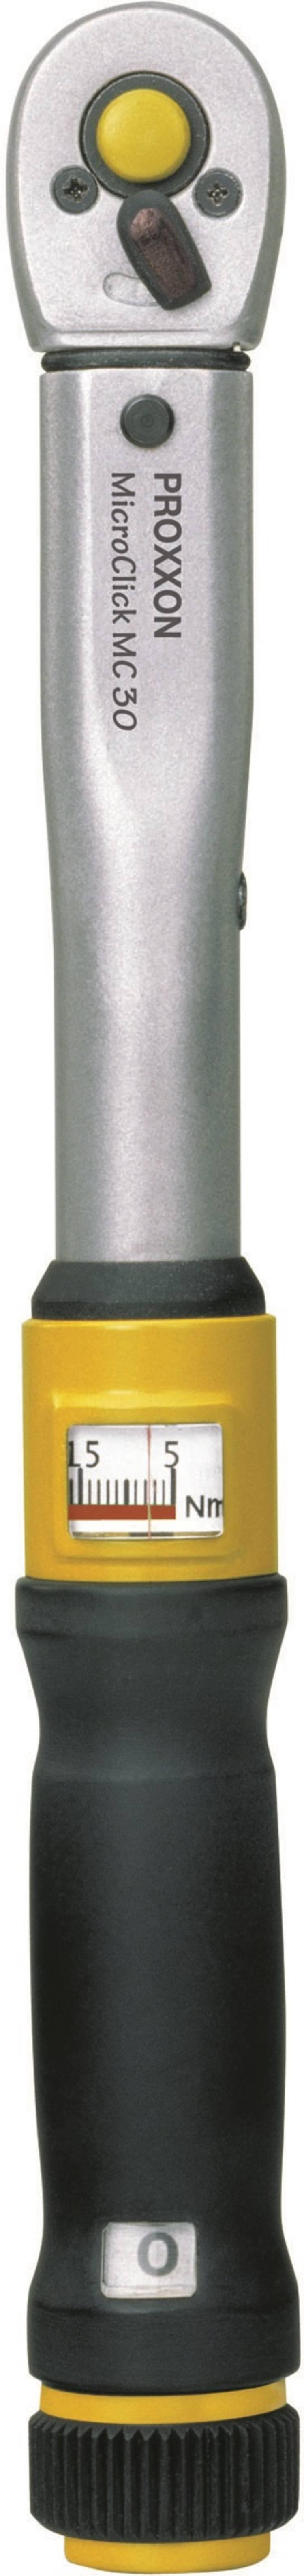 Proxxon Industrial MicroClick MC 30 23349 Momentsleutel met omschakelbare ratel 1 4 (6.3 mm) 6 - 30 Nm